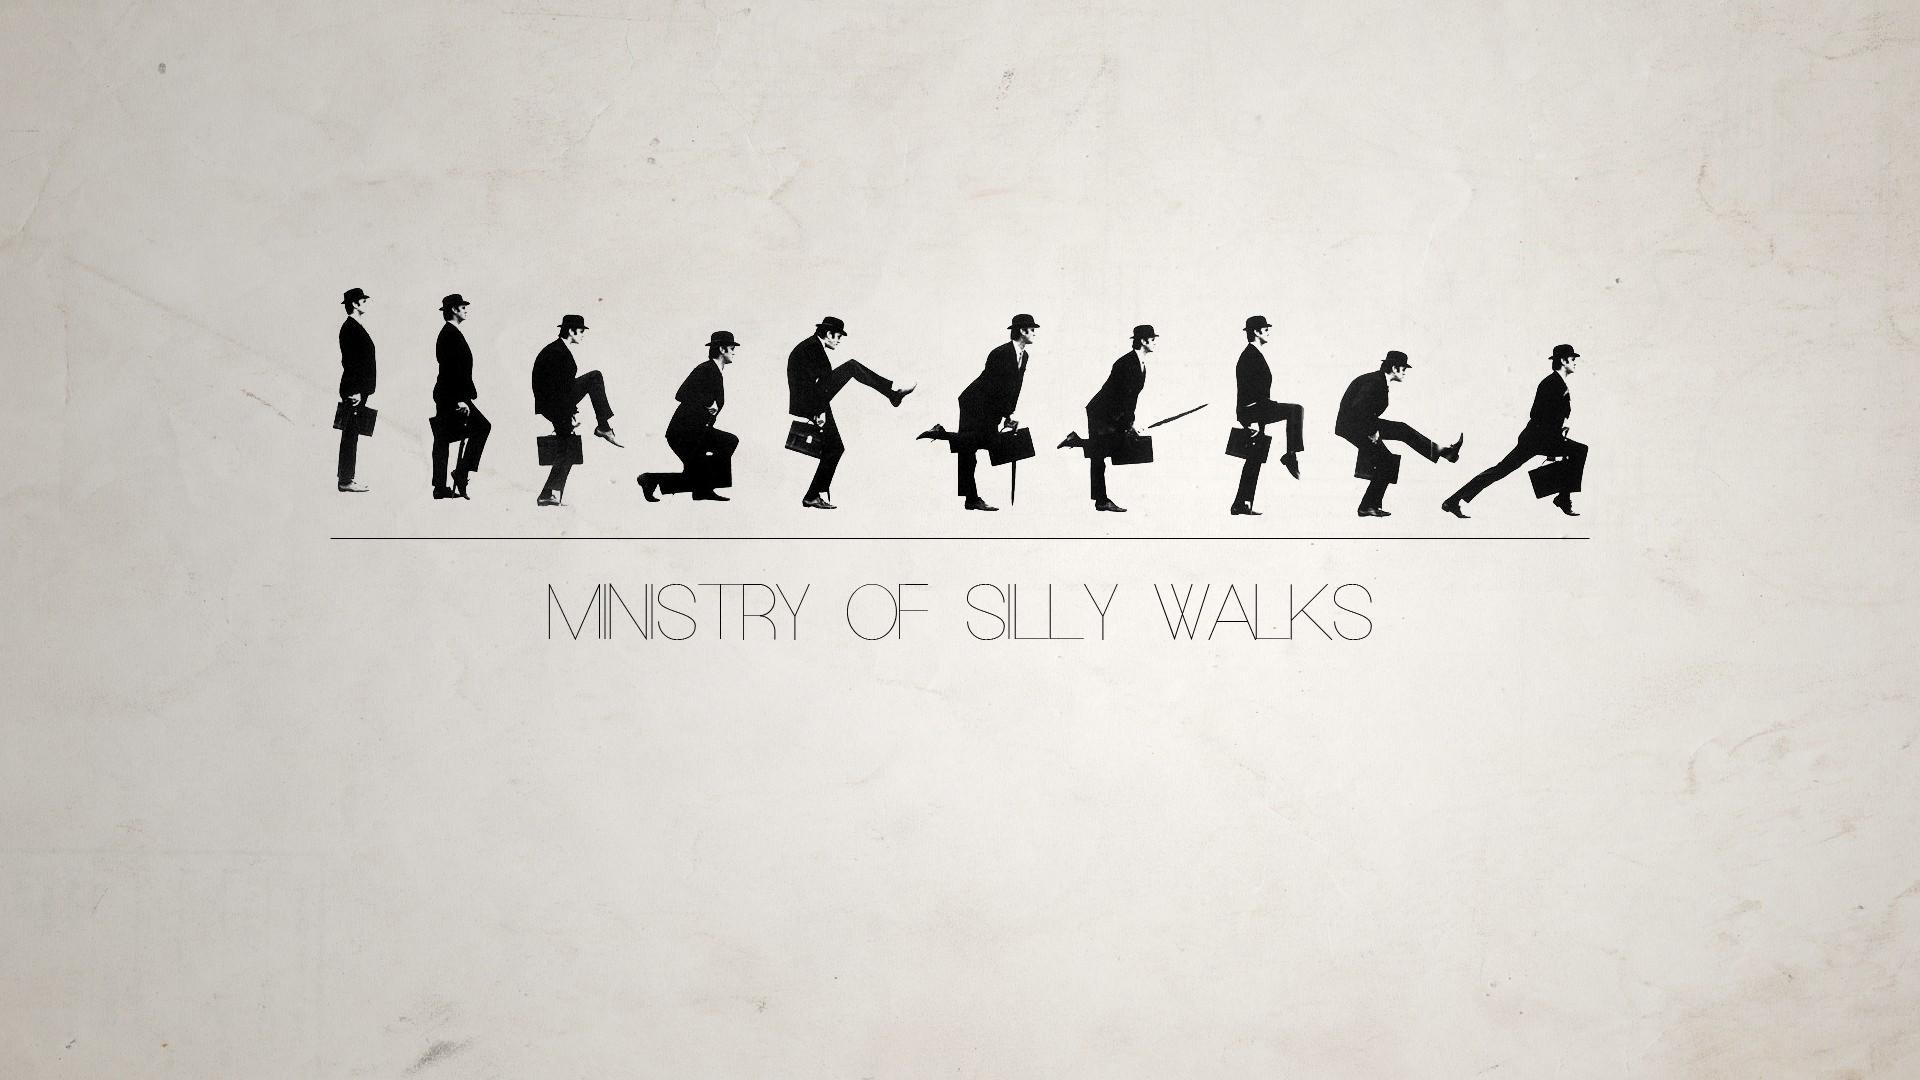 Wallpapers Humor Monty Python